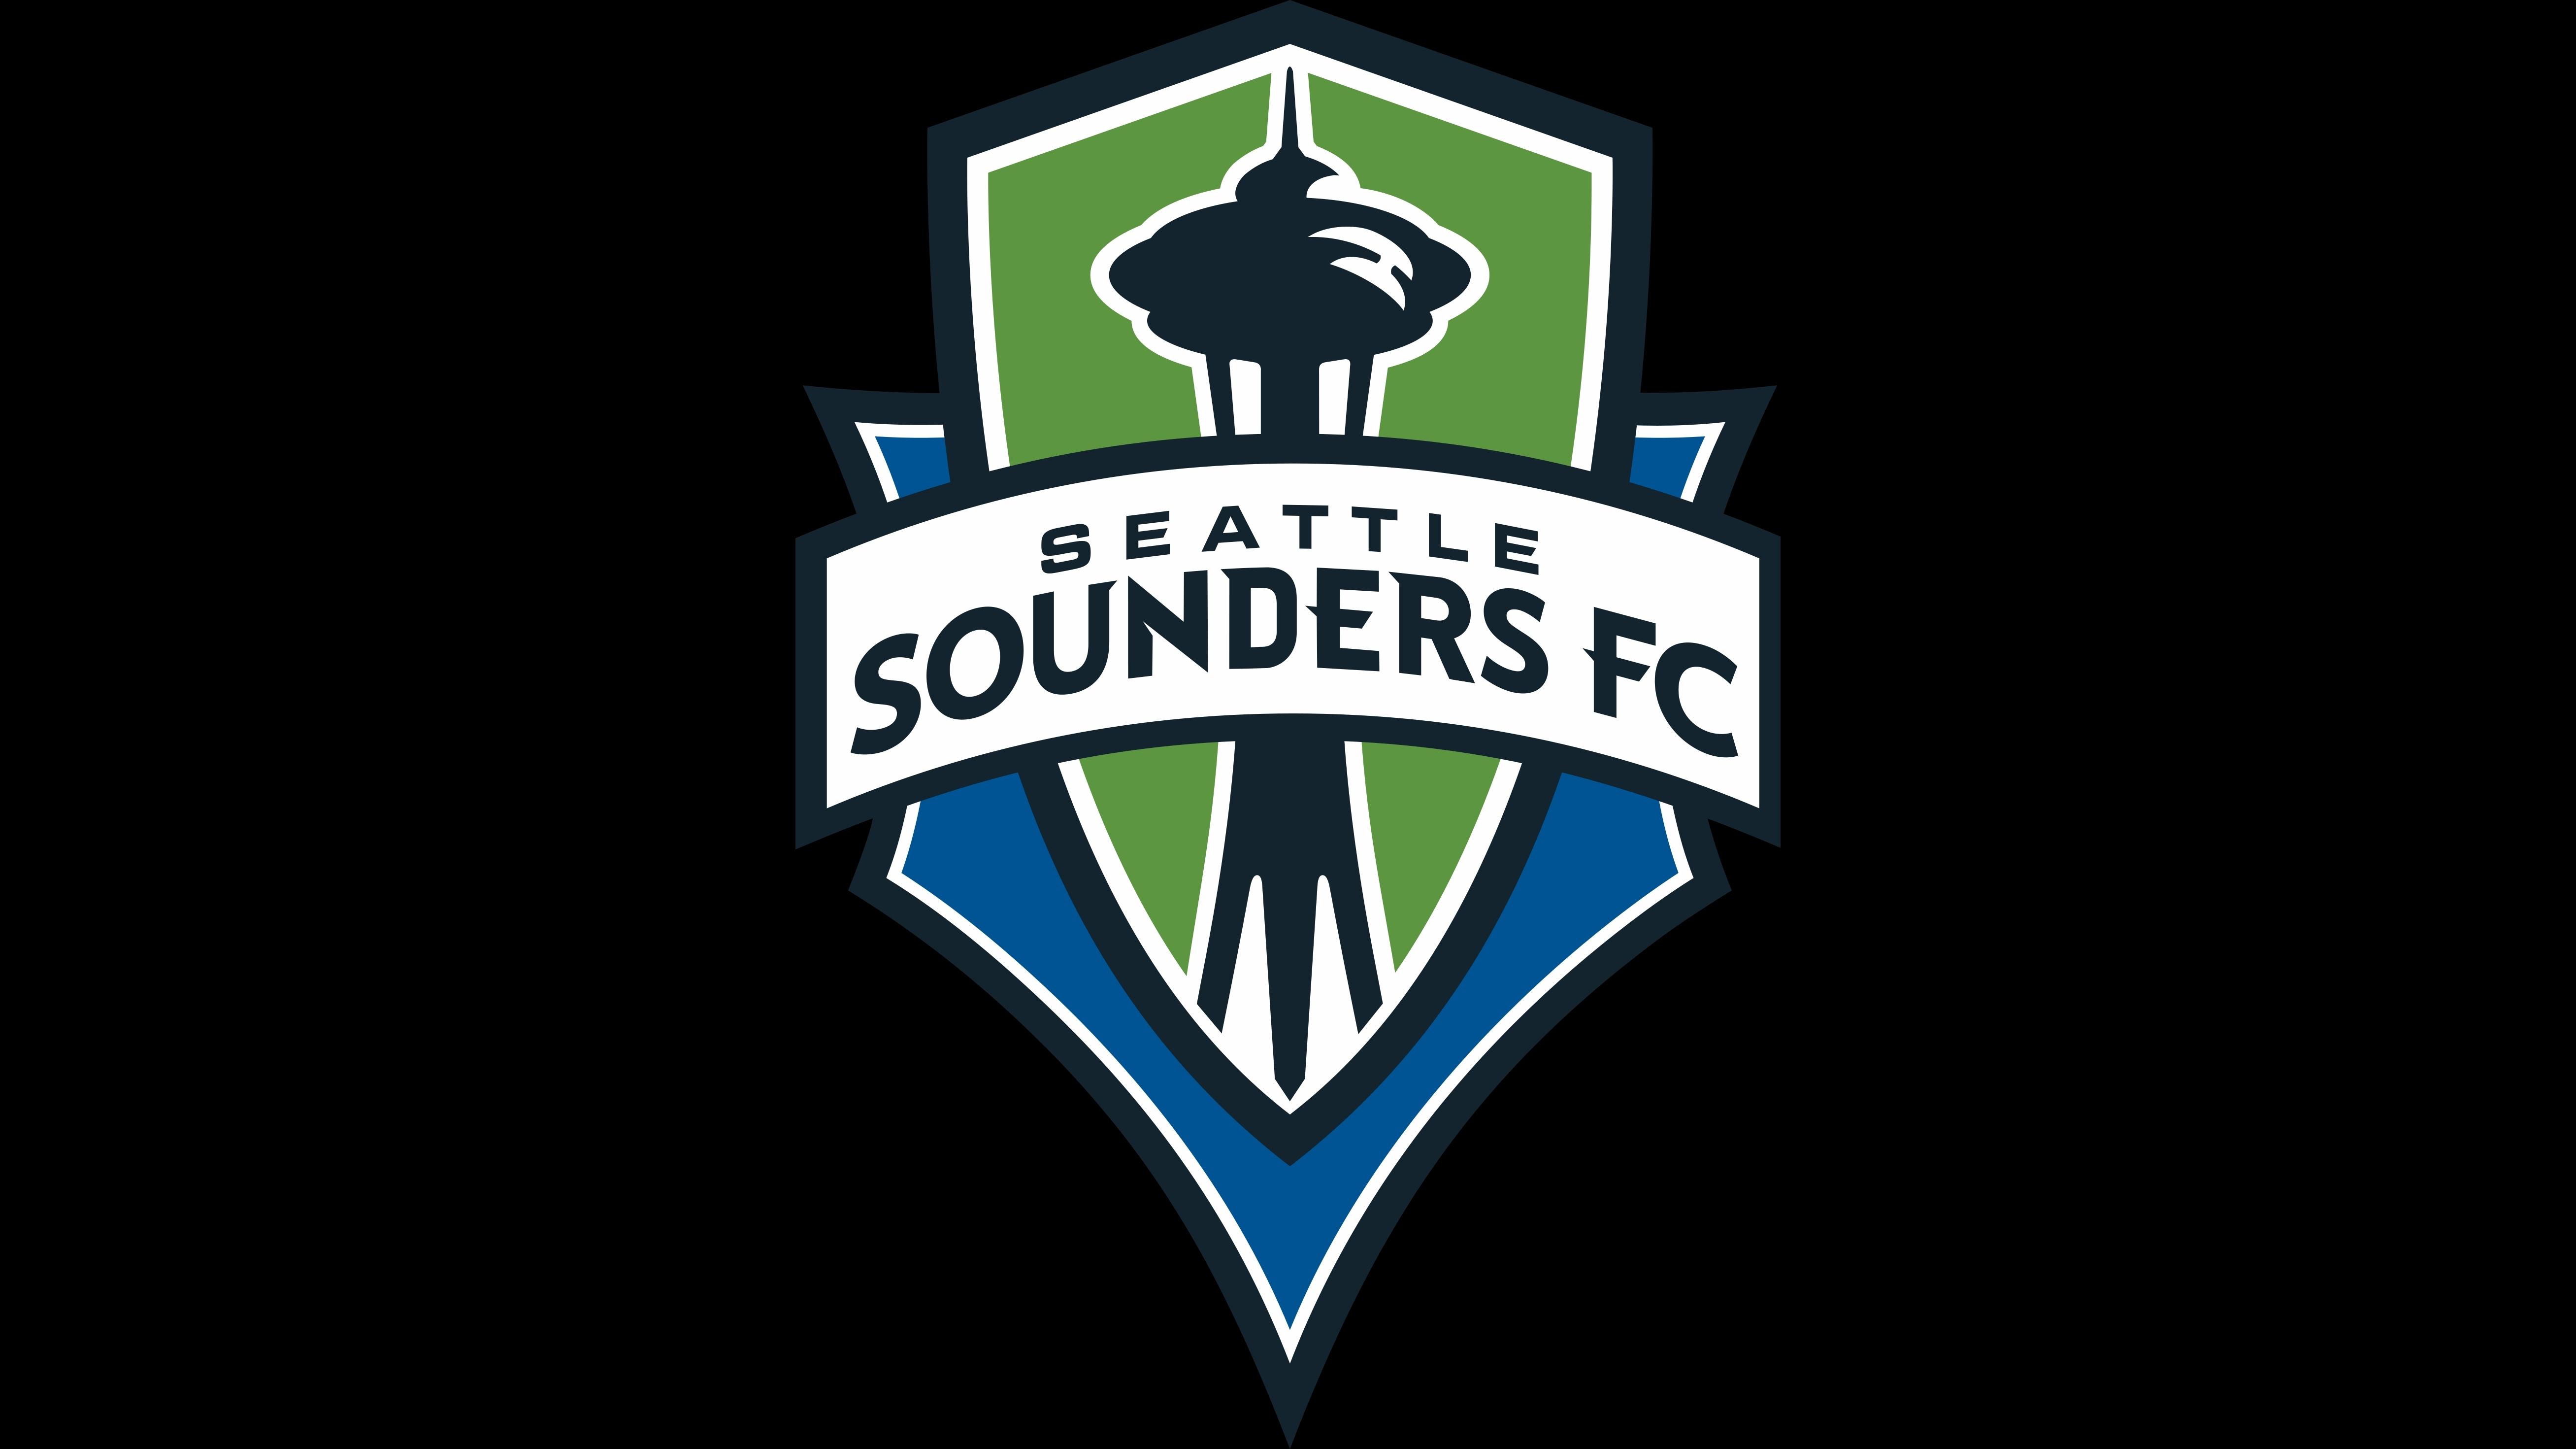 Seattle Sounders IPhone Wallpaper 8W7KE6K 5230x2941   Picseriocom 5230x2941